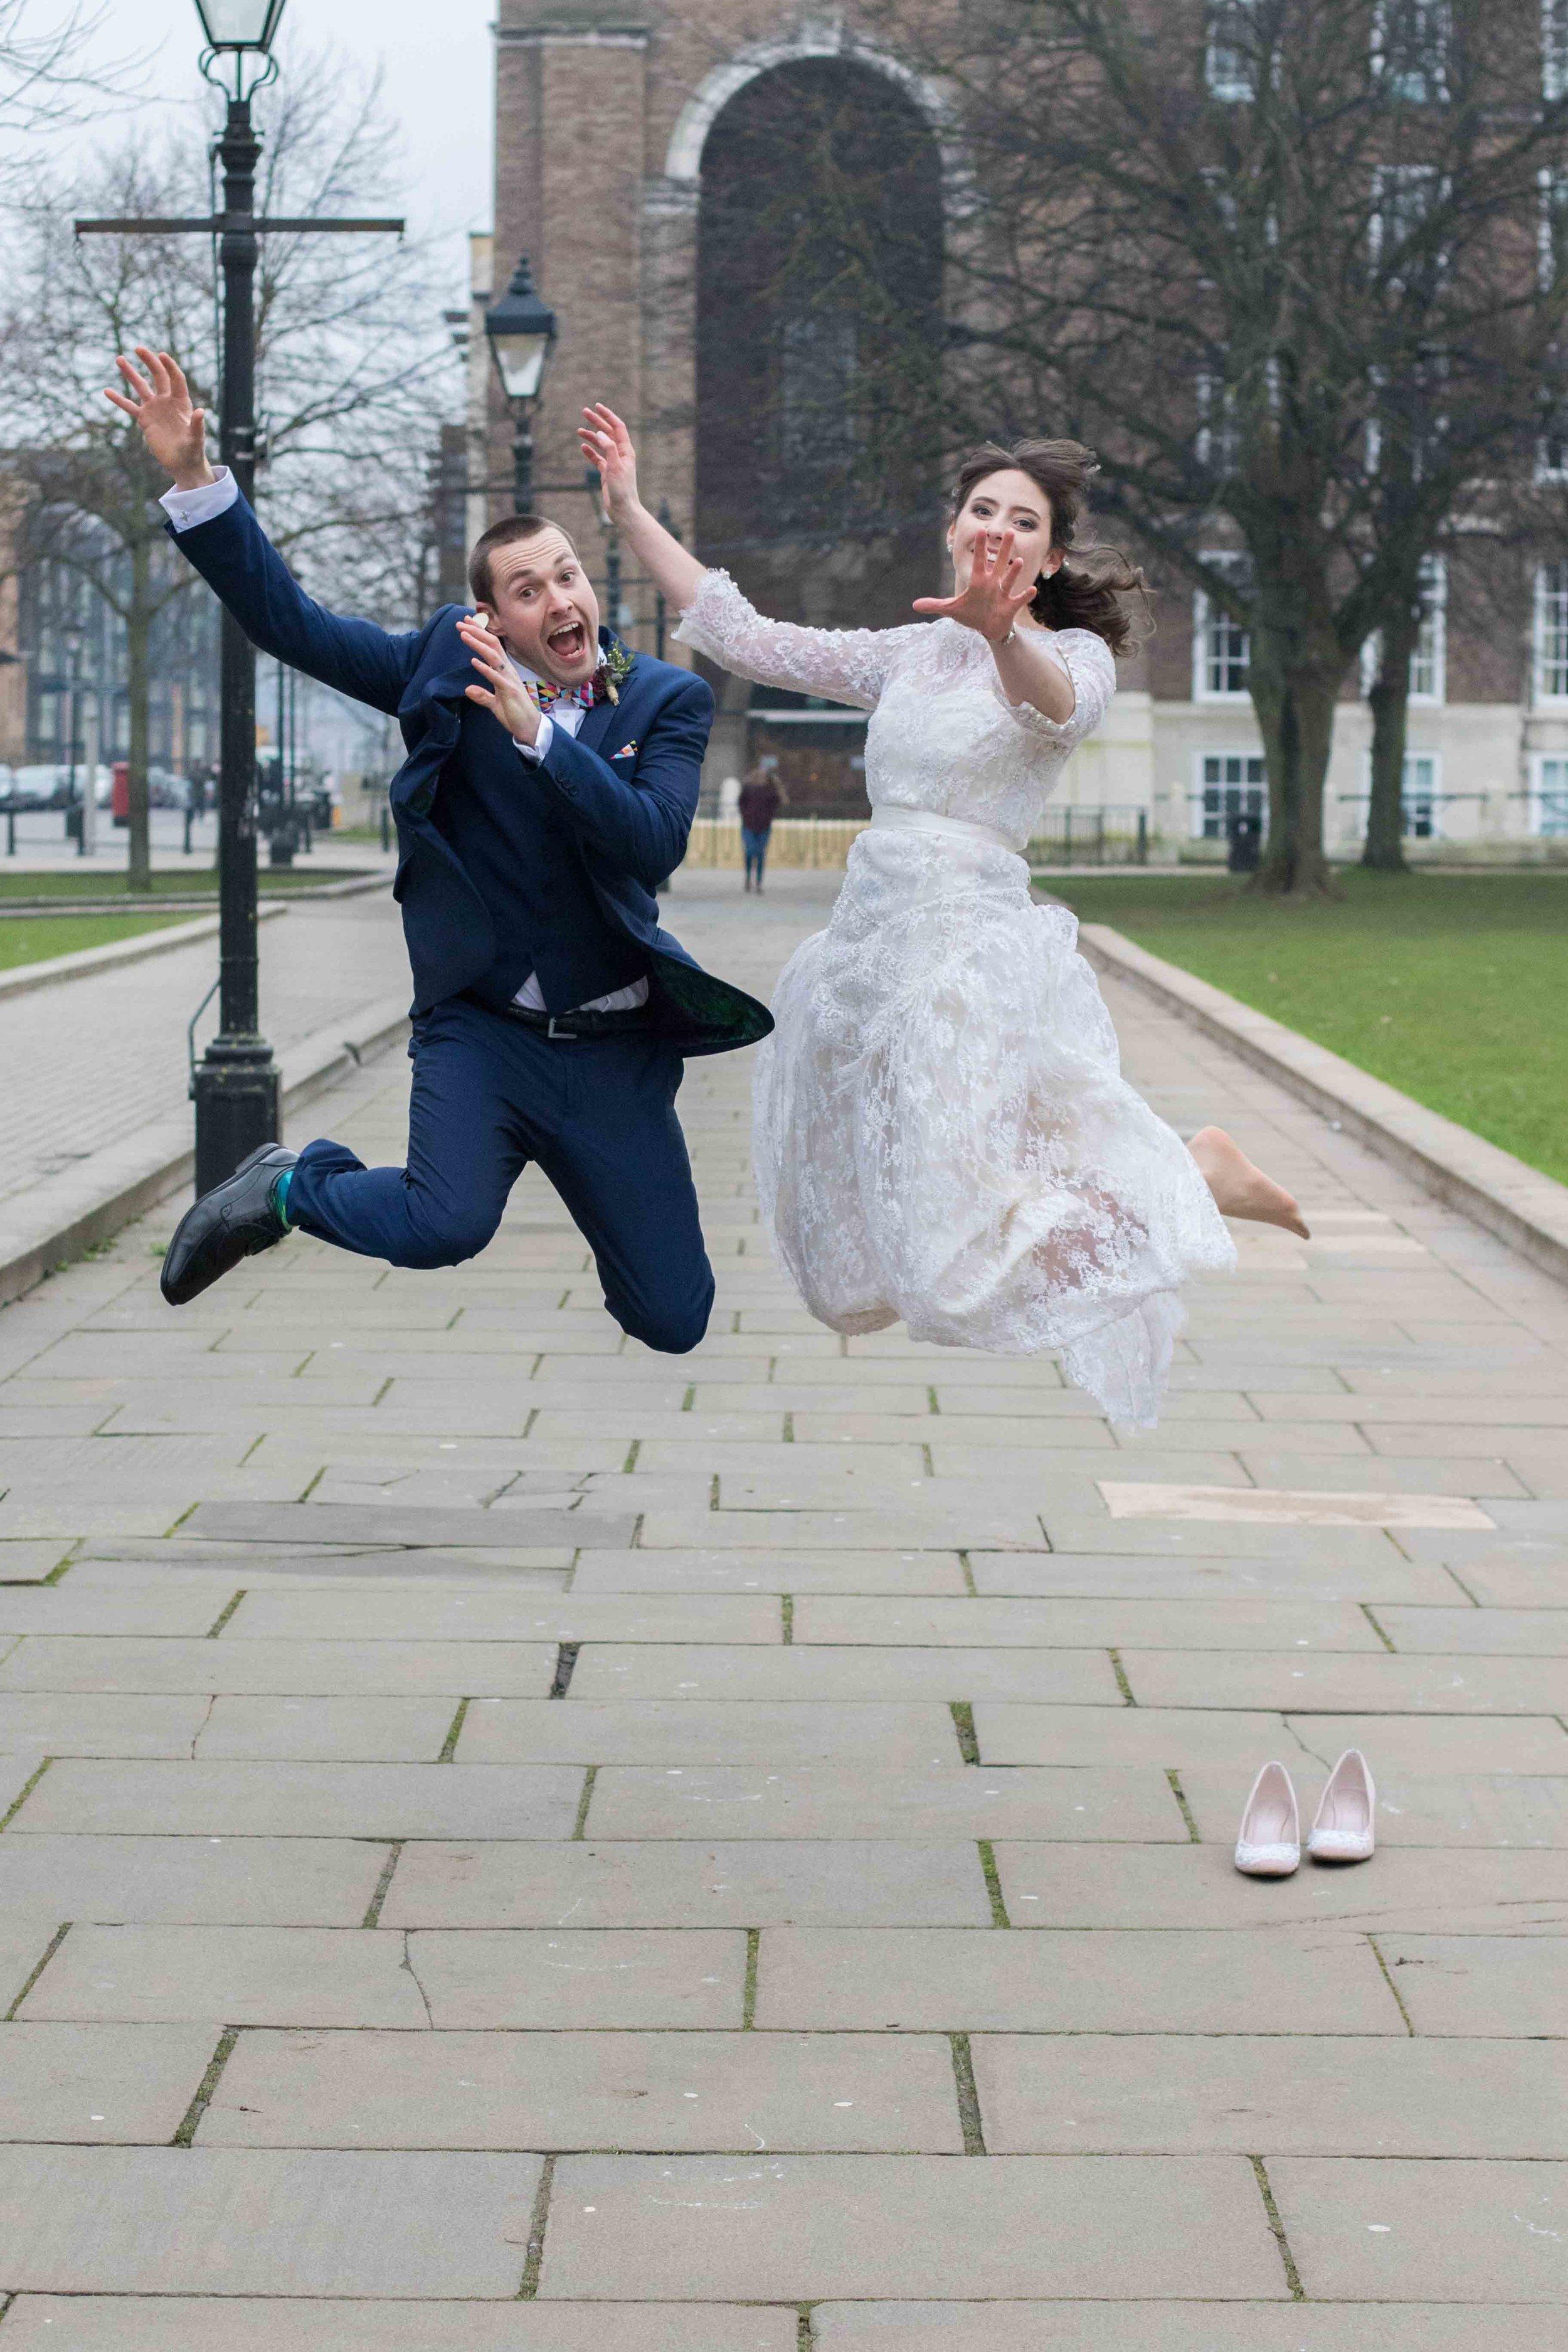 Adam & Faye - Wright Wedding Photography - Bristol Wedding Photographer -290.jpg